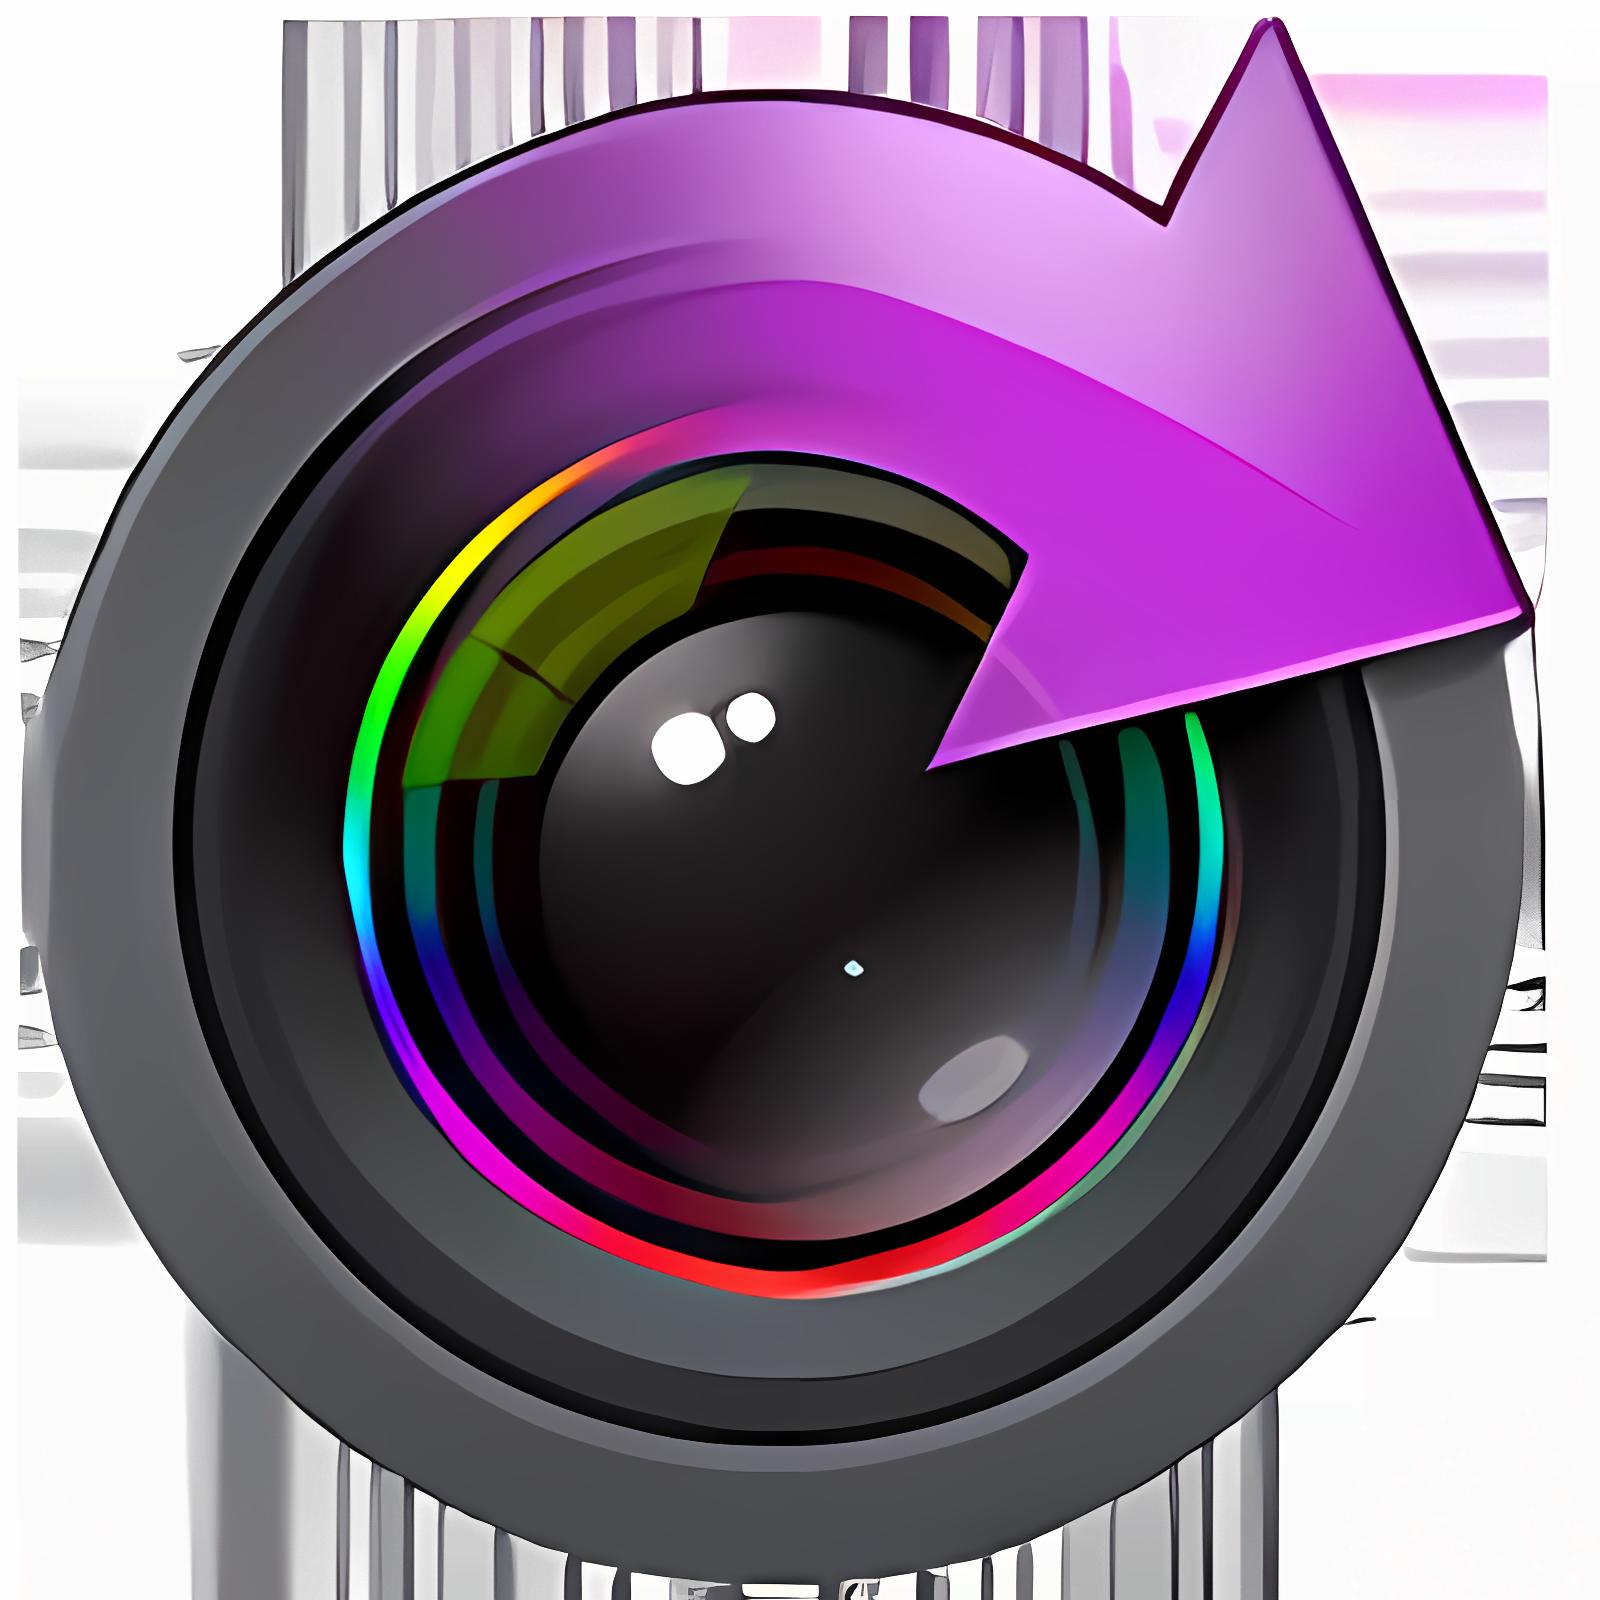 iOrgSoft AVCHD Converter 4.0.5